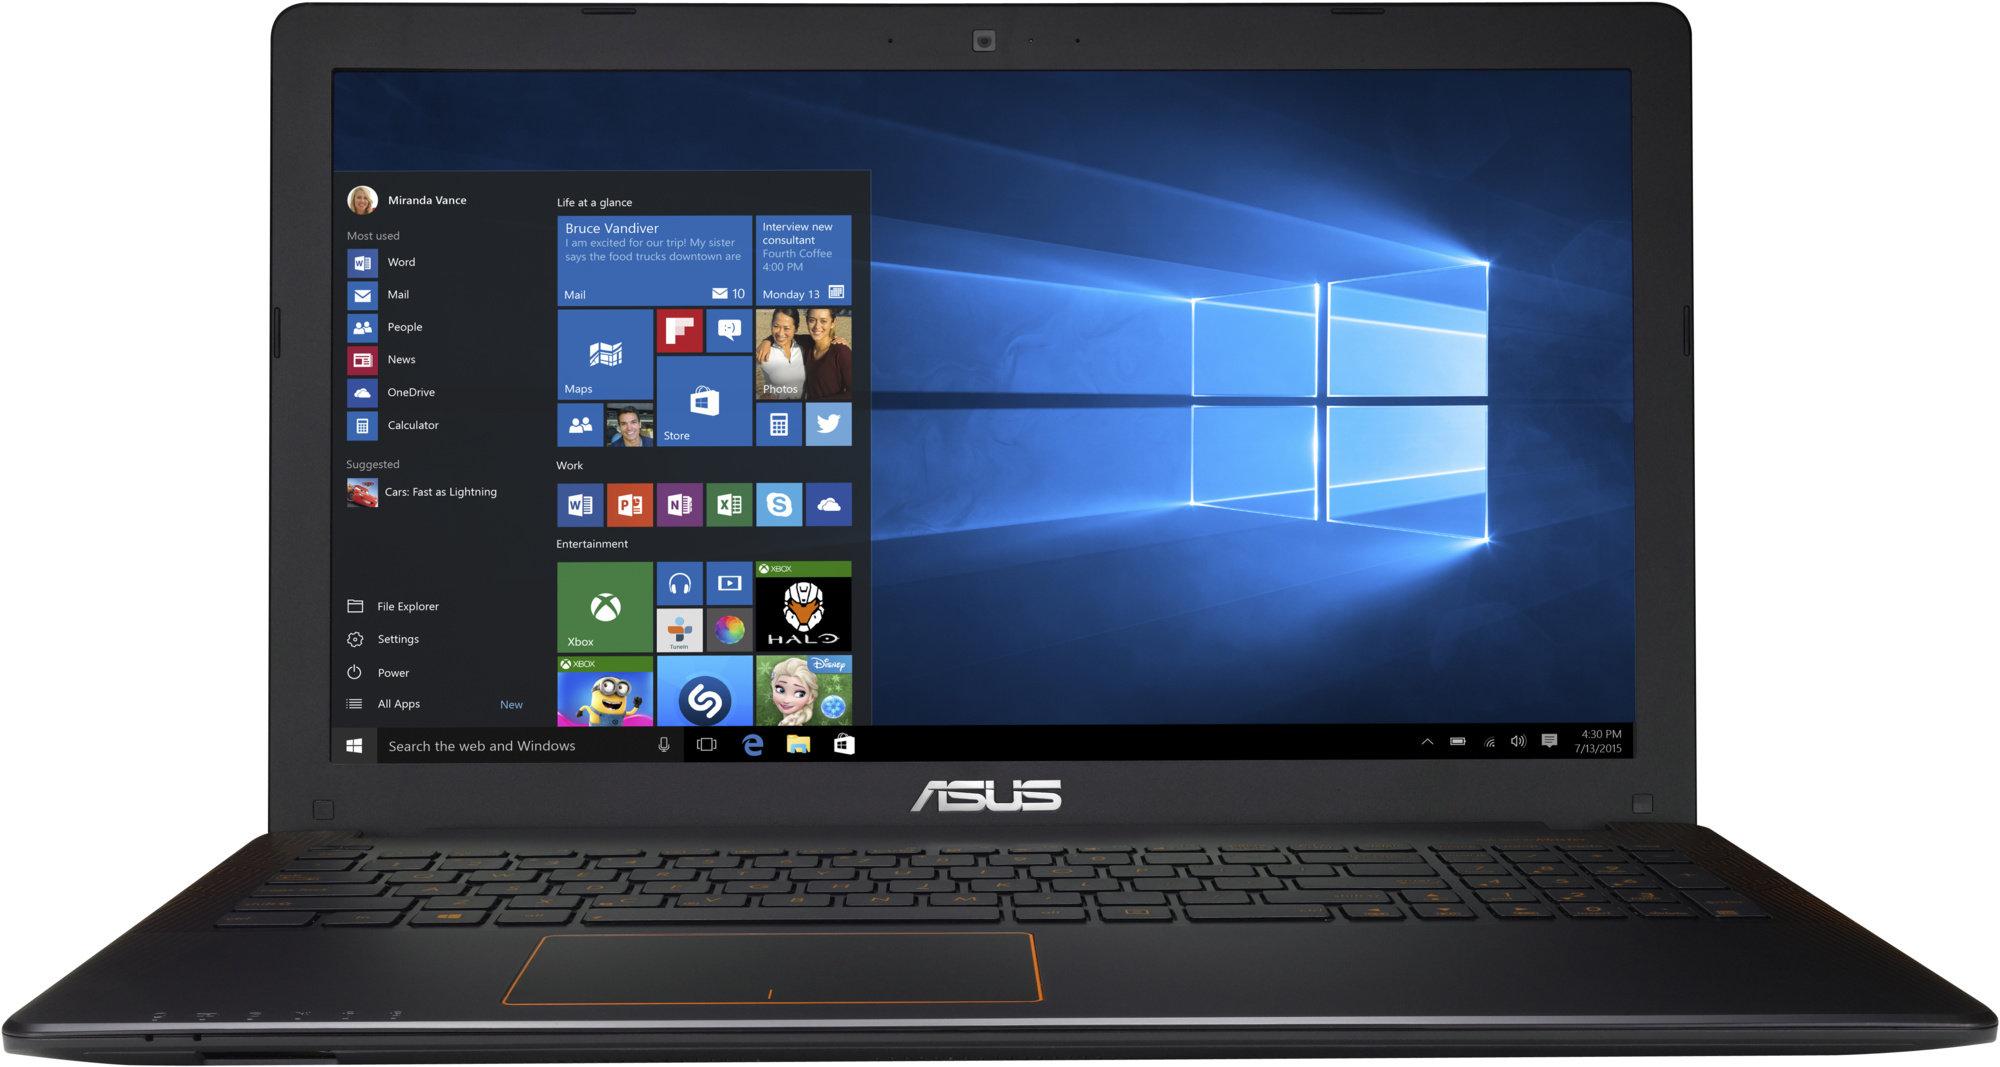 "ASUS F550VX-DM587T i7-7700HQ/8+8GB/256GB SSD M.2 + 1TB 5400 ot./GeForce 950M/15,6"" FHD LED matný/Win10/black"